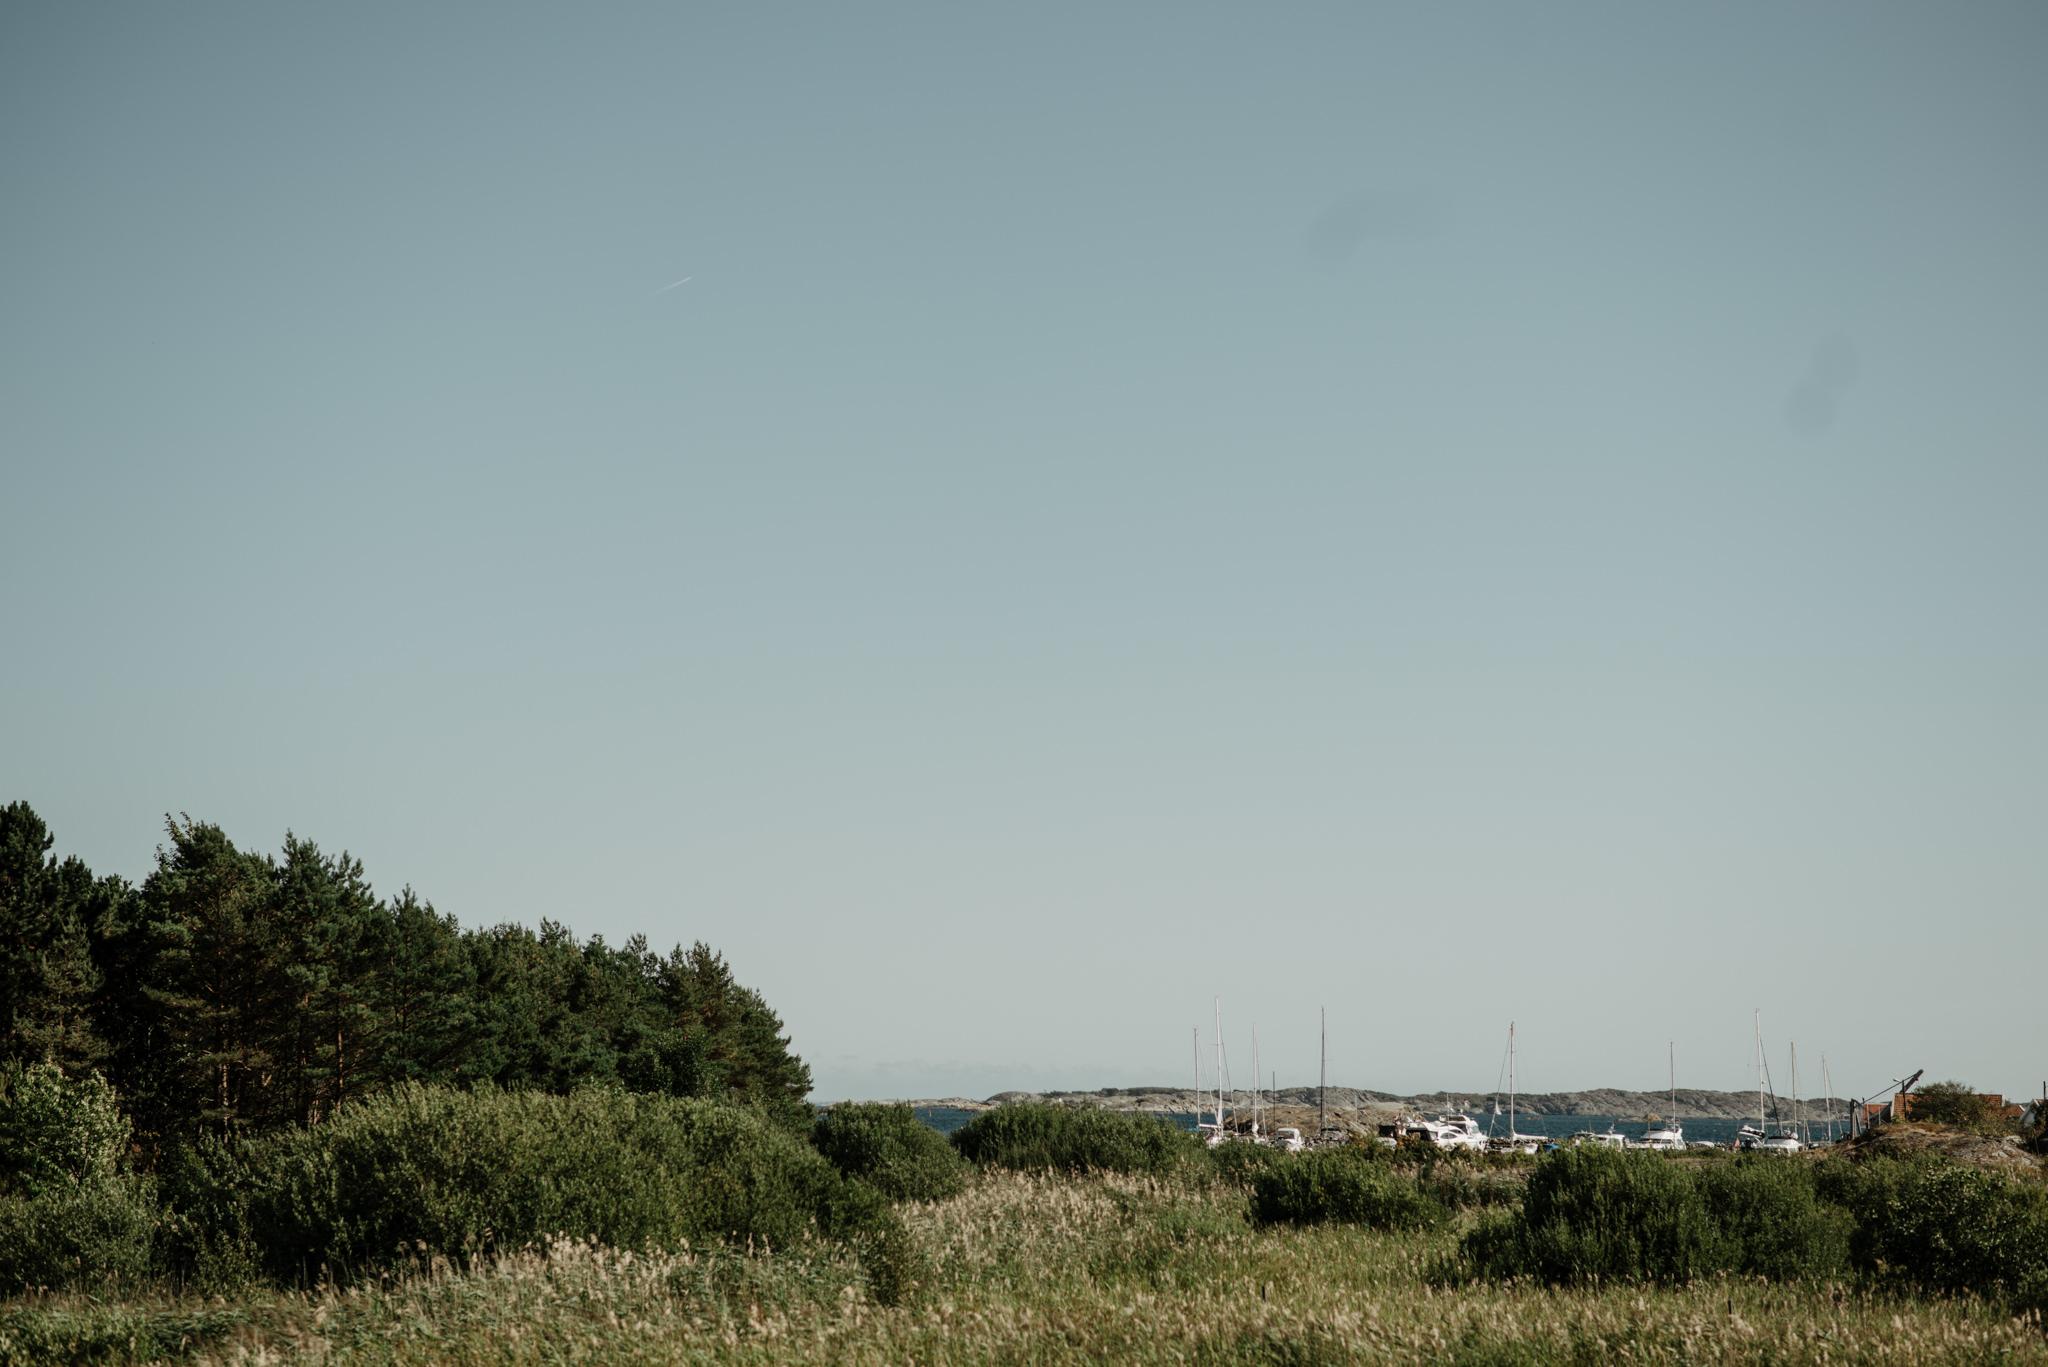 skargardsbrollop-goteborg-koster-sydkoster-00052.jpg